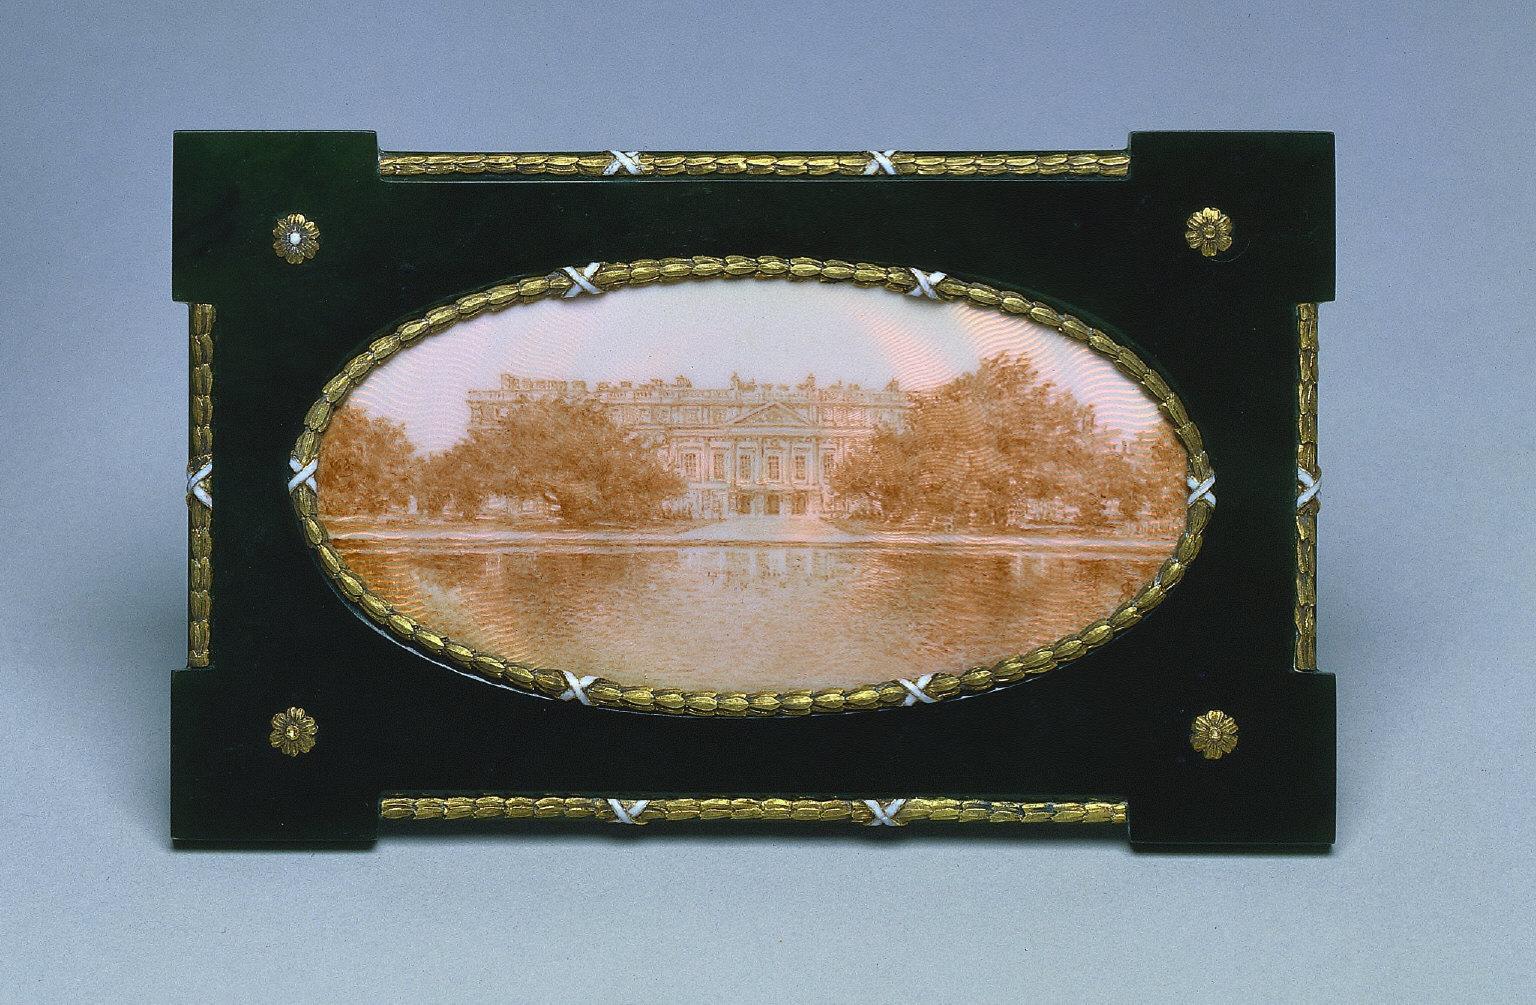 Framed Miniature of Hampton Court